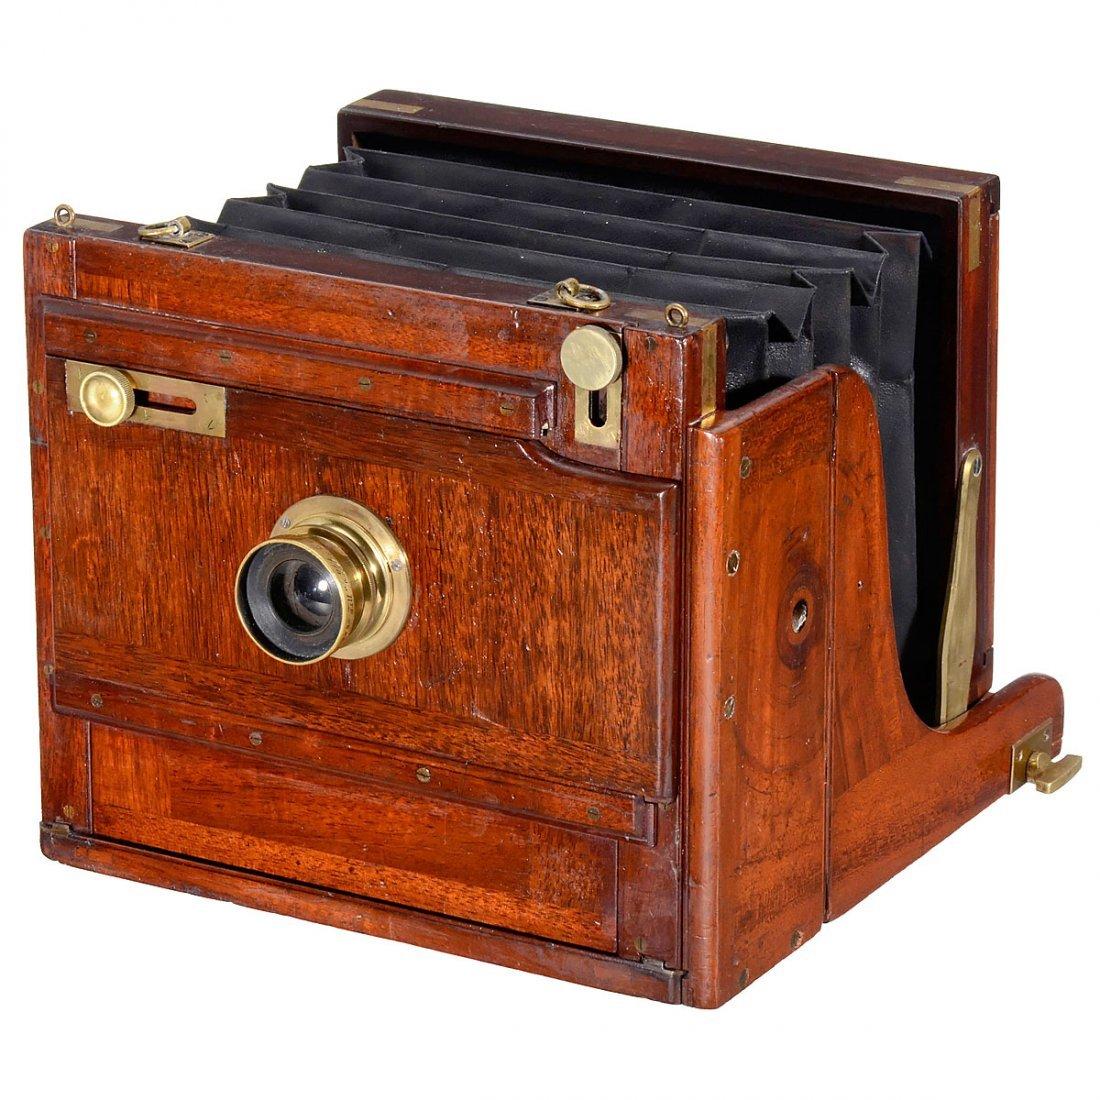 "English Stereo Camera for ""Sliding Lens Board"", c. 1880"